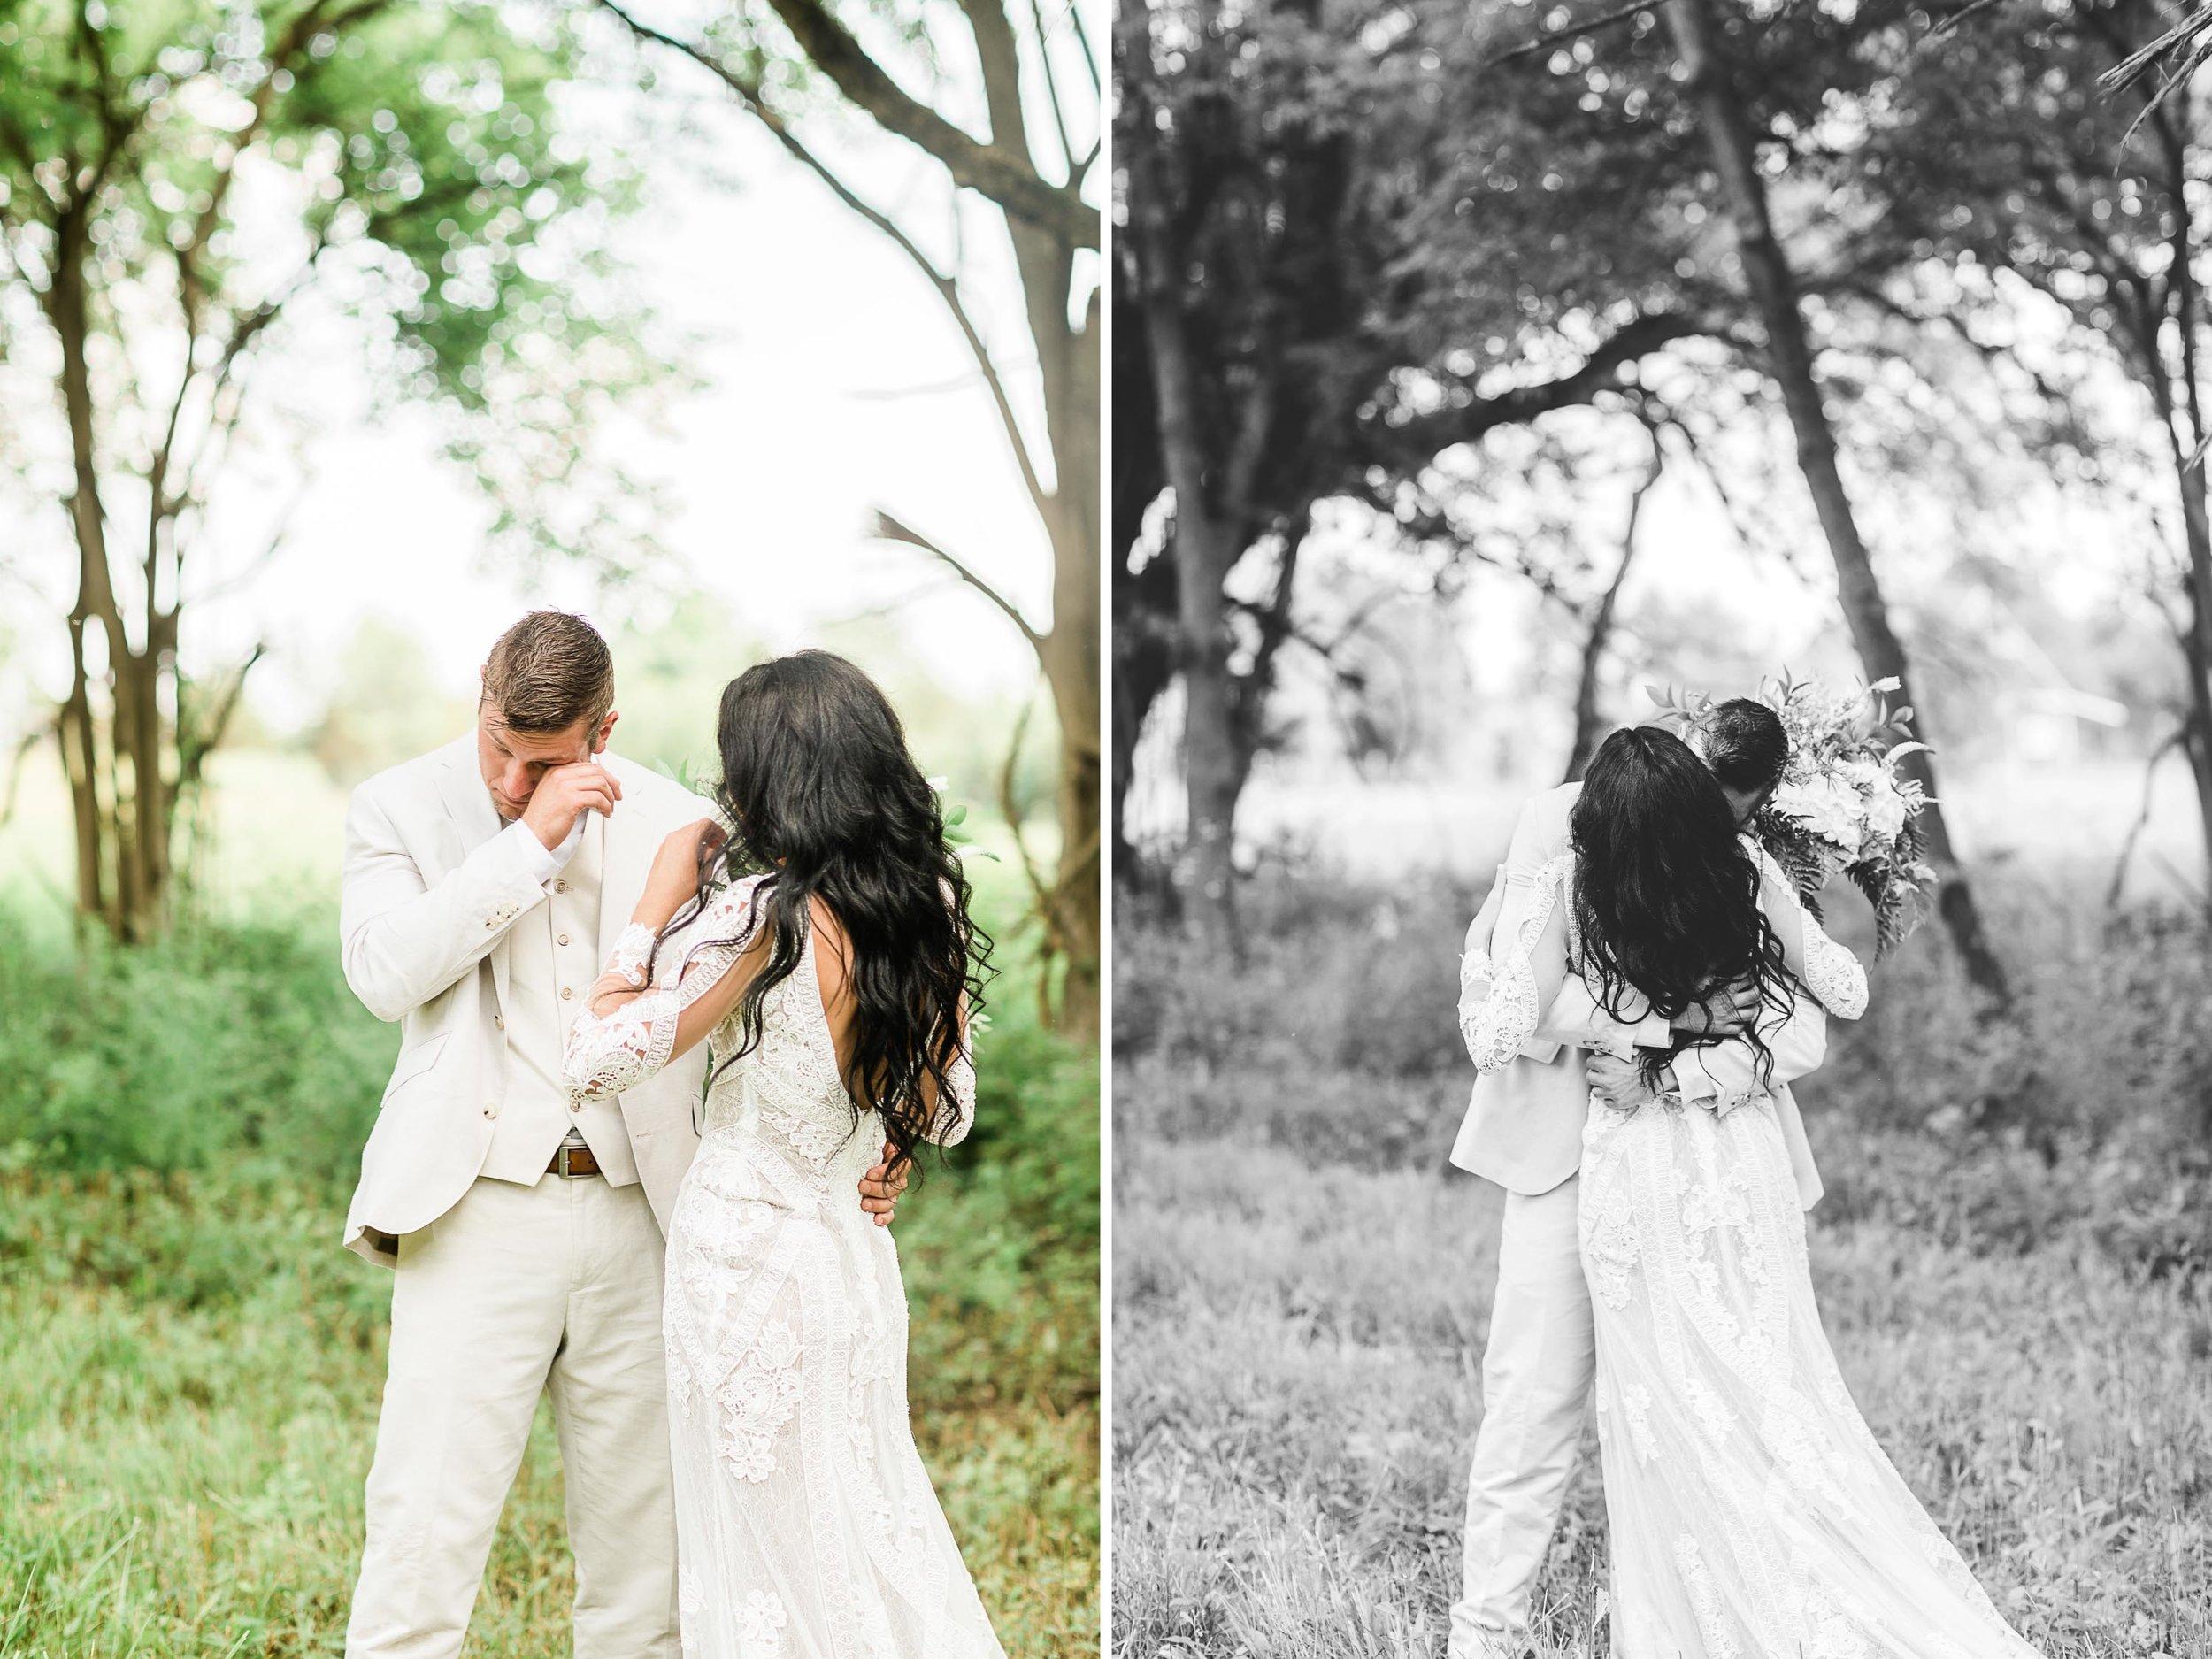 wedding photographers near me dayton ohio.jpg